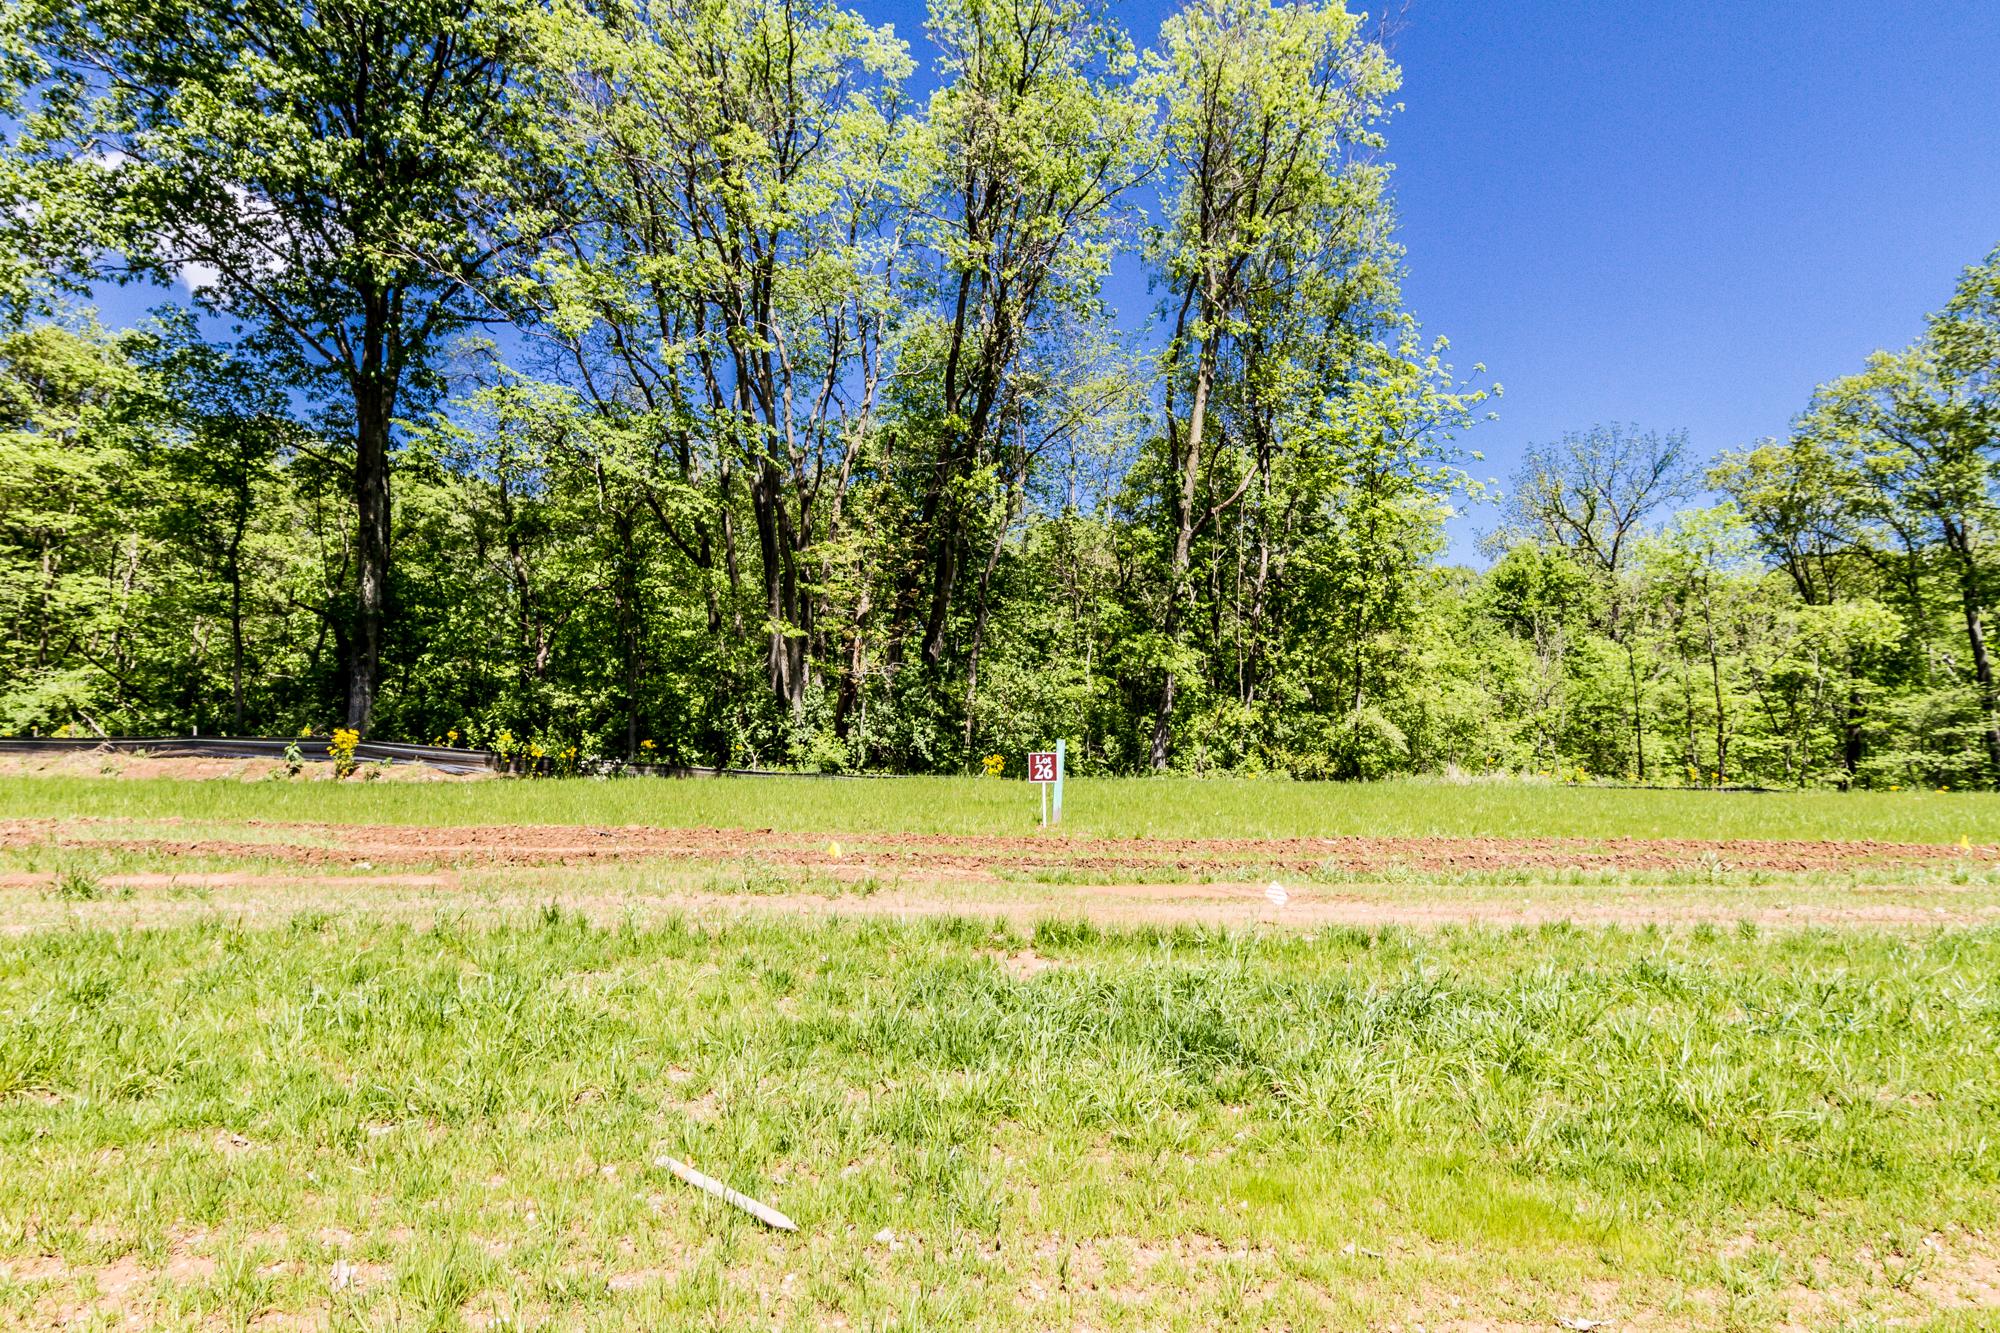 Bethel_Ridge_Farms_O'Fallon_Illinois_Progress_5.3.17-2.jpg